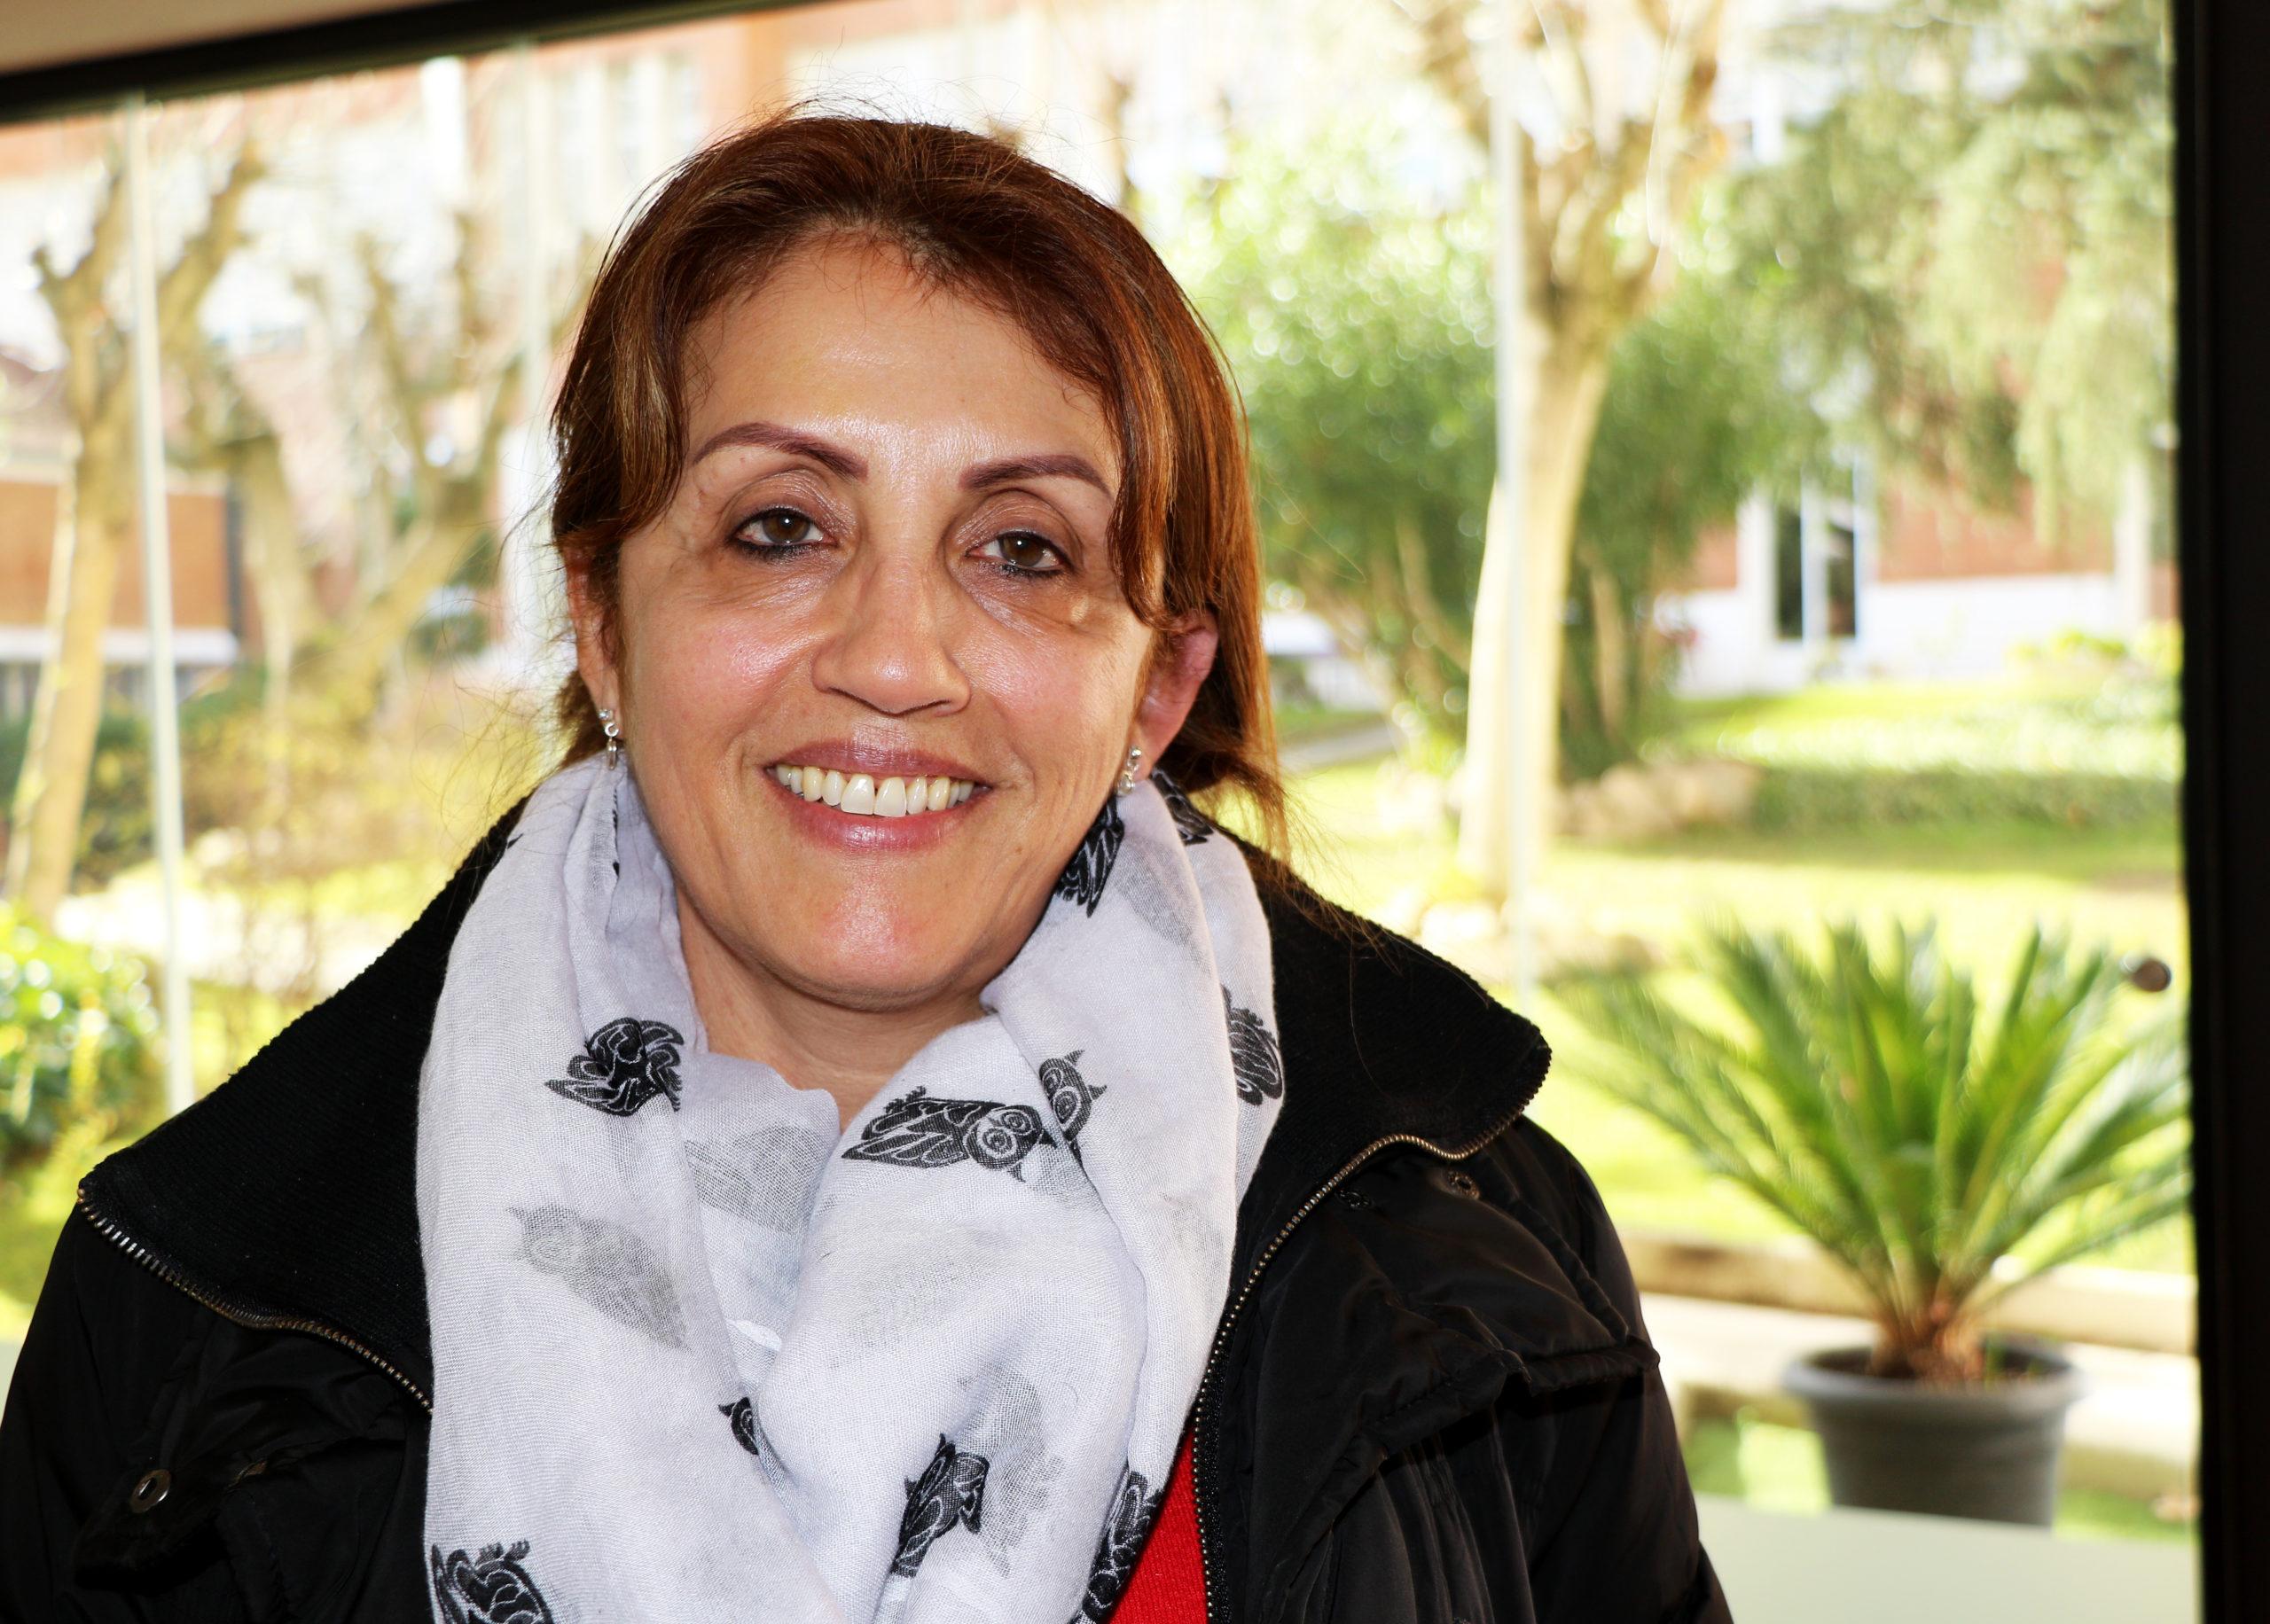 Hebe González, misionera laica de Paraguay © Manos Unidas